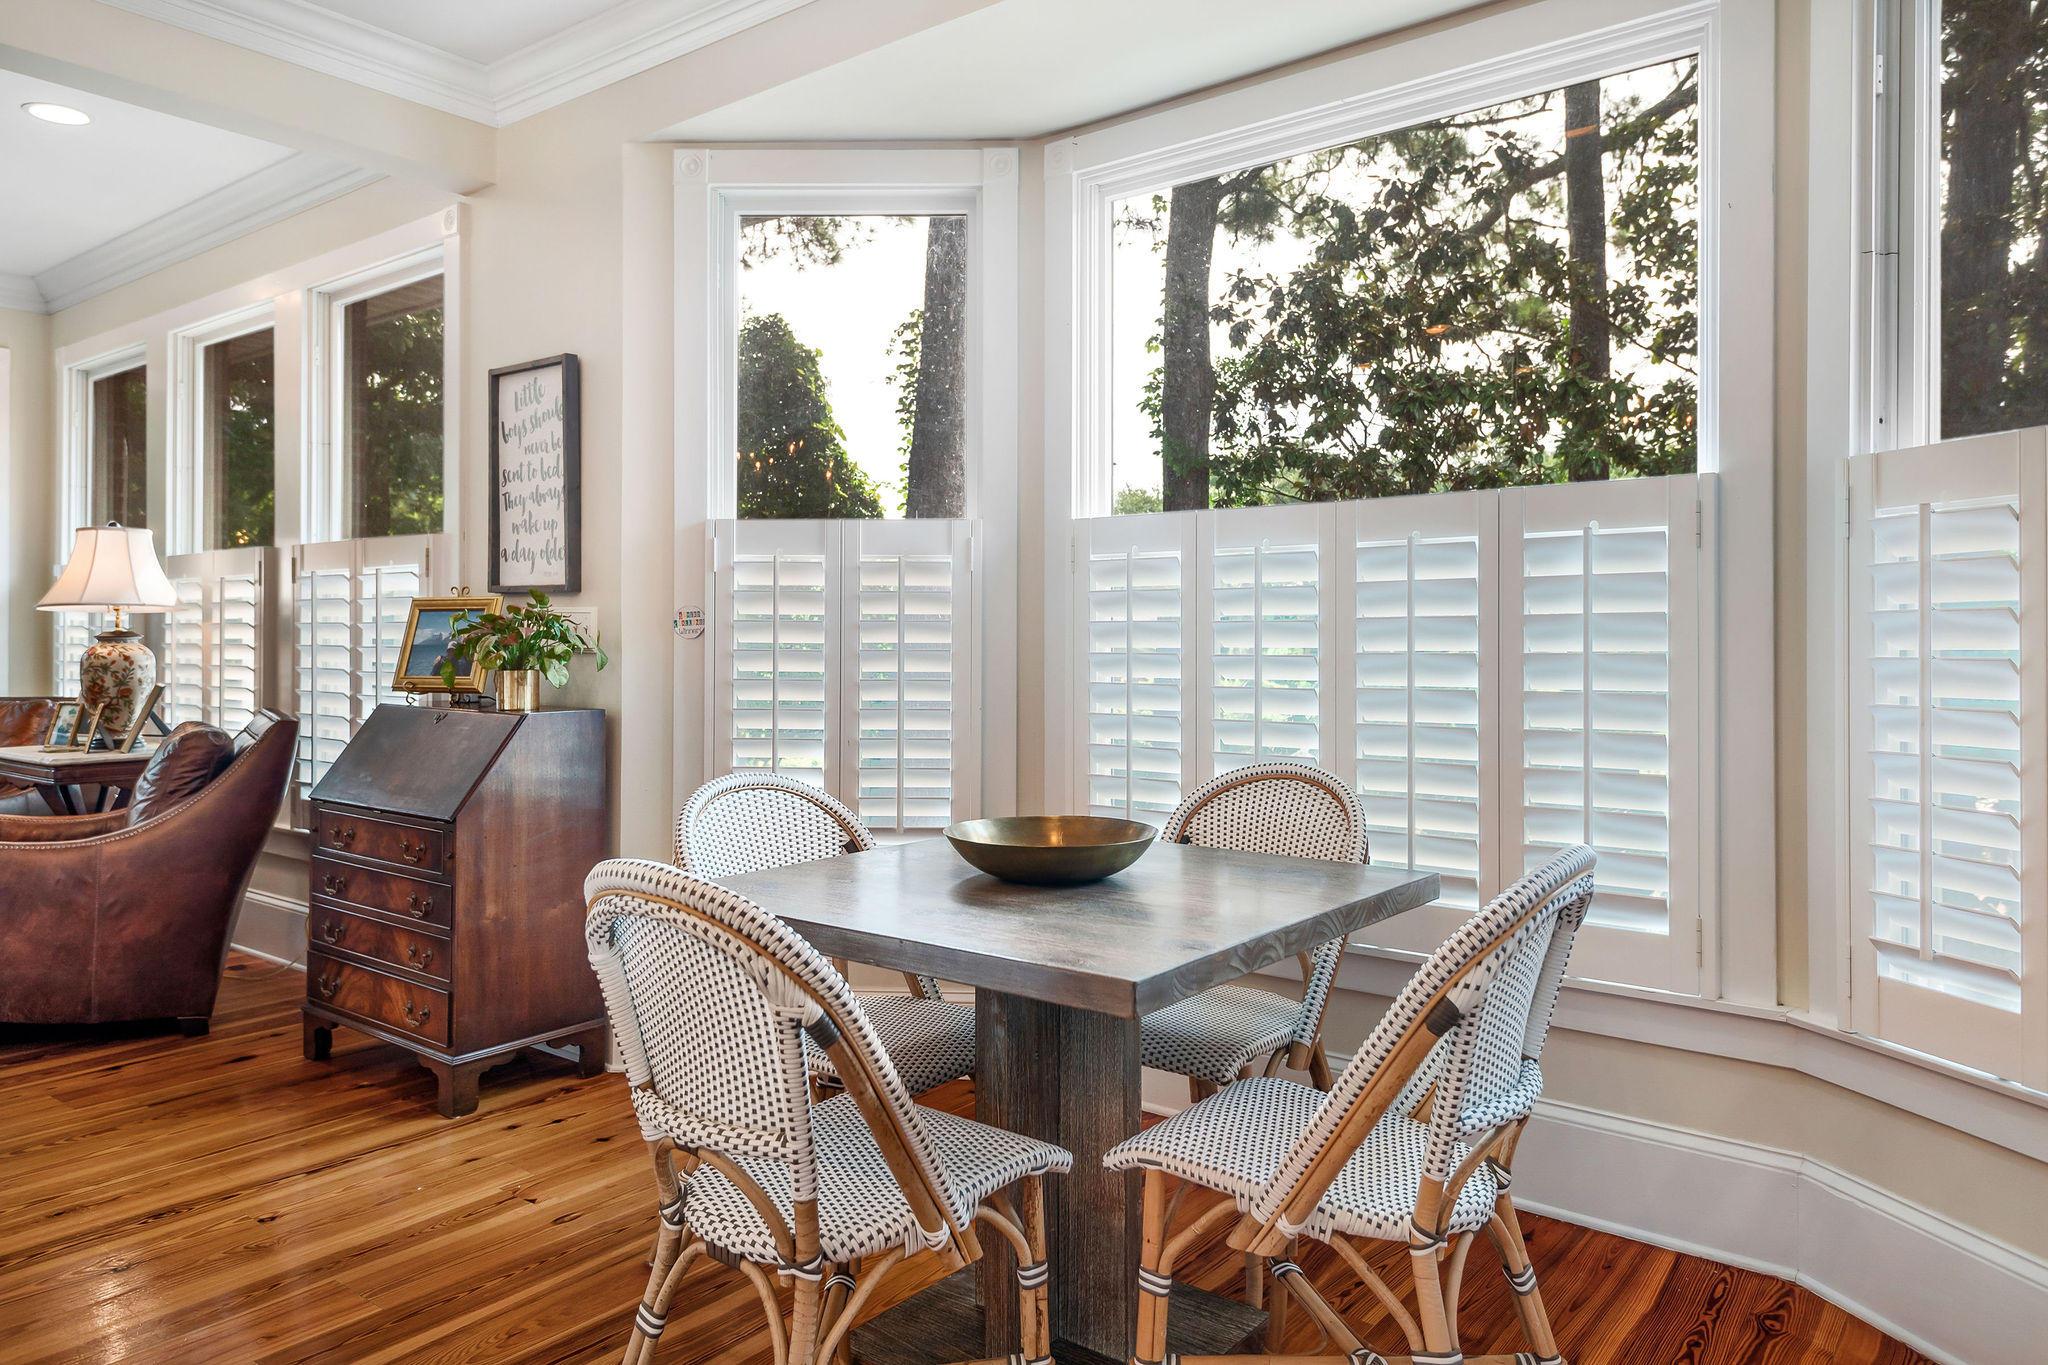 Country Club II Homes For Sale - 1482 Burningtree, Charleston, SC - 48